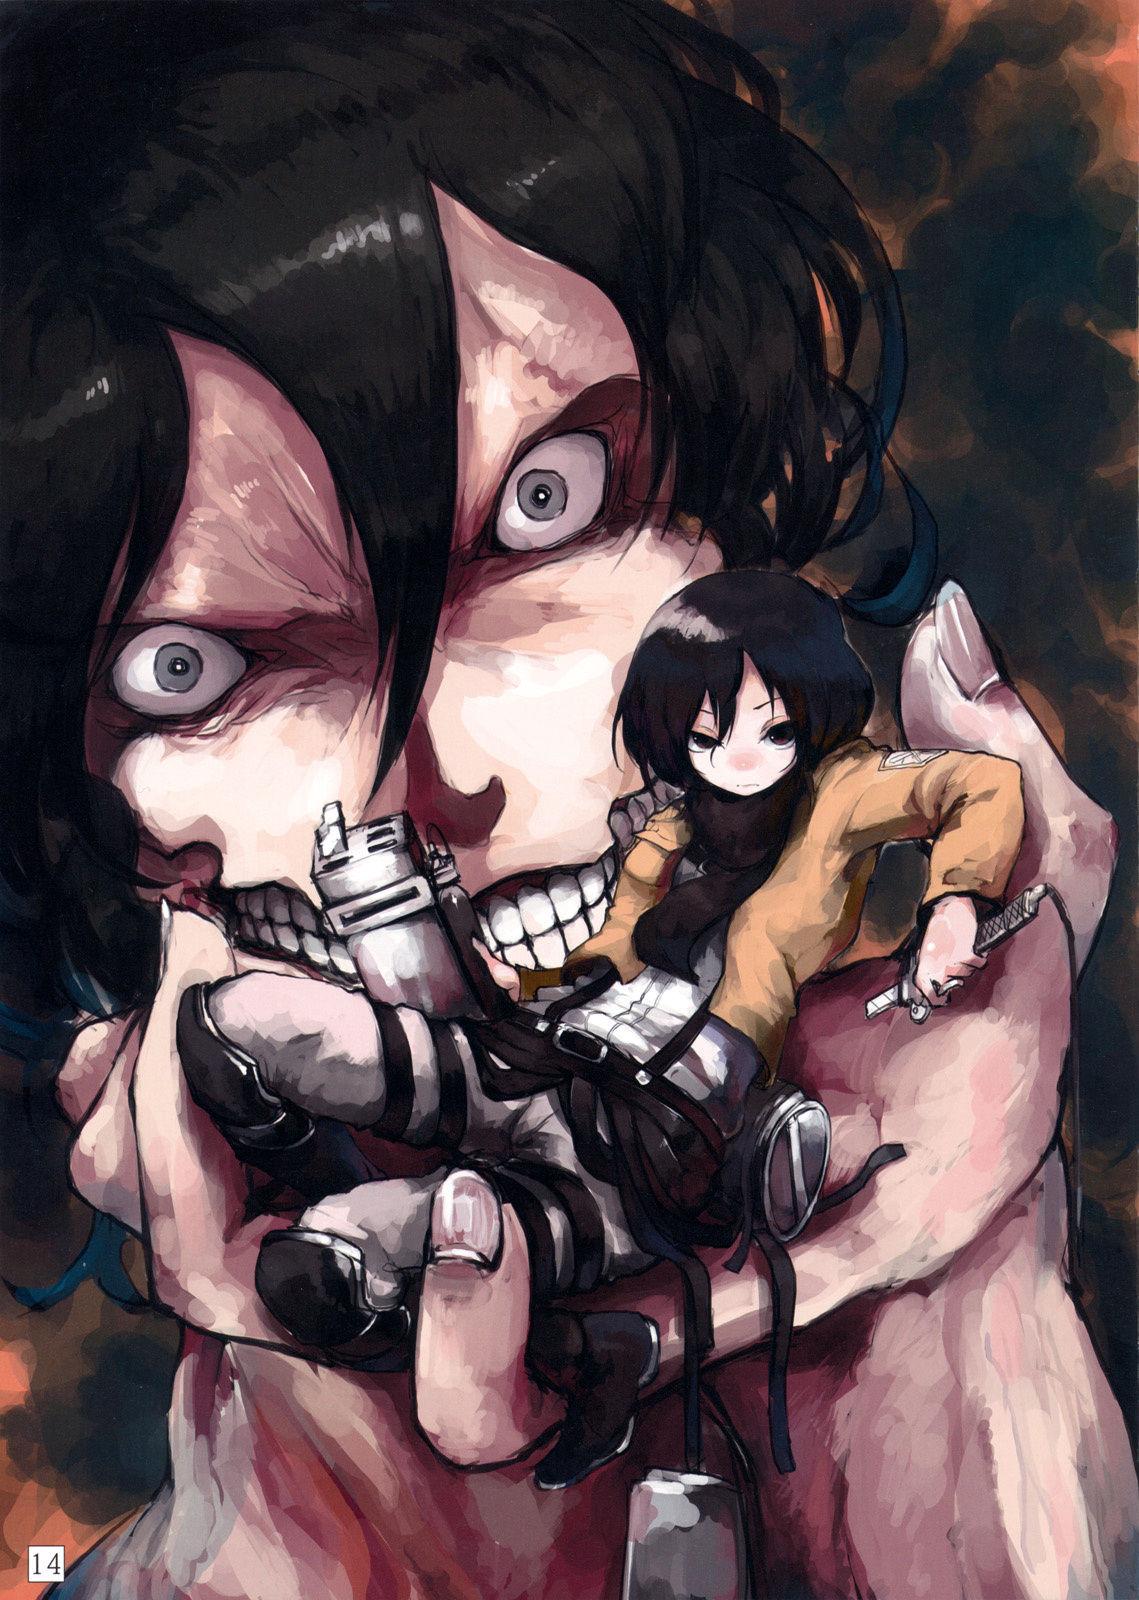 Shinngeki vol 1 hentai manga picture 11